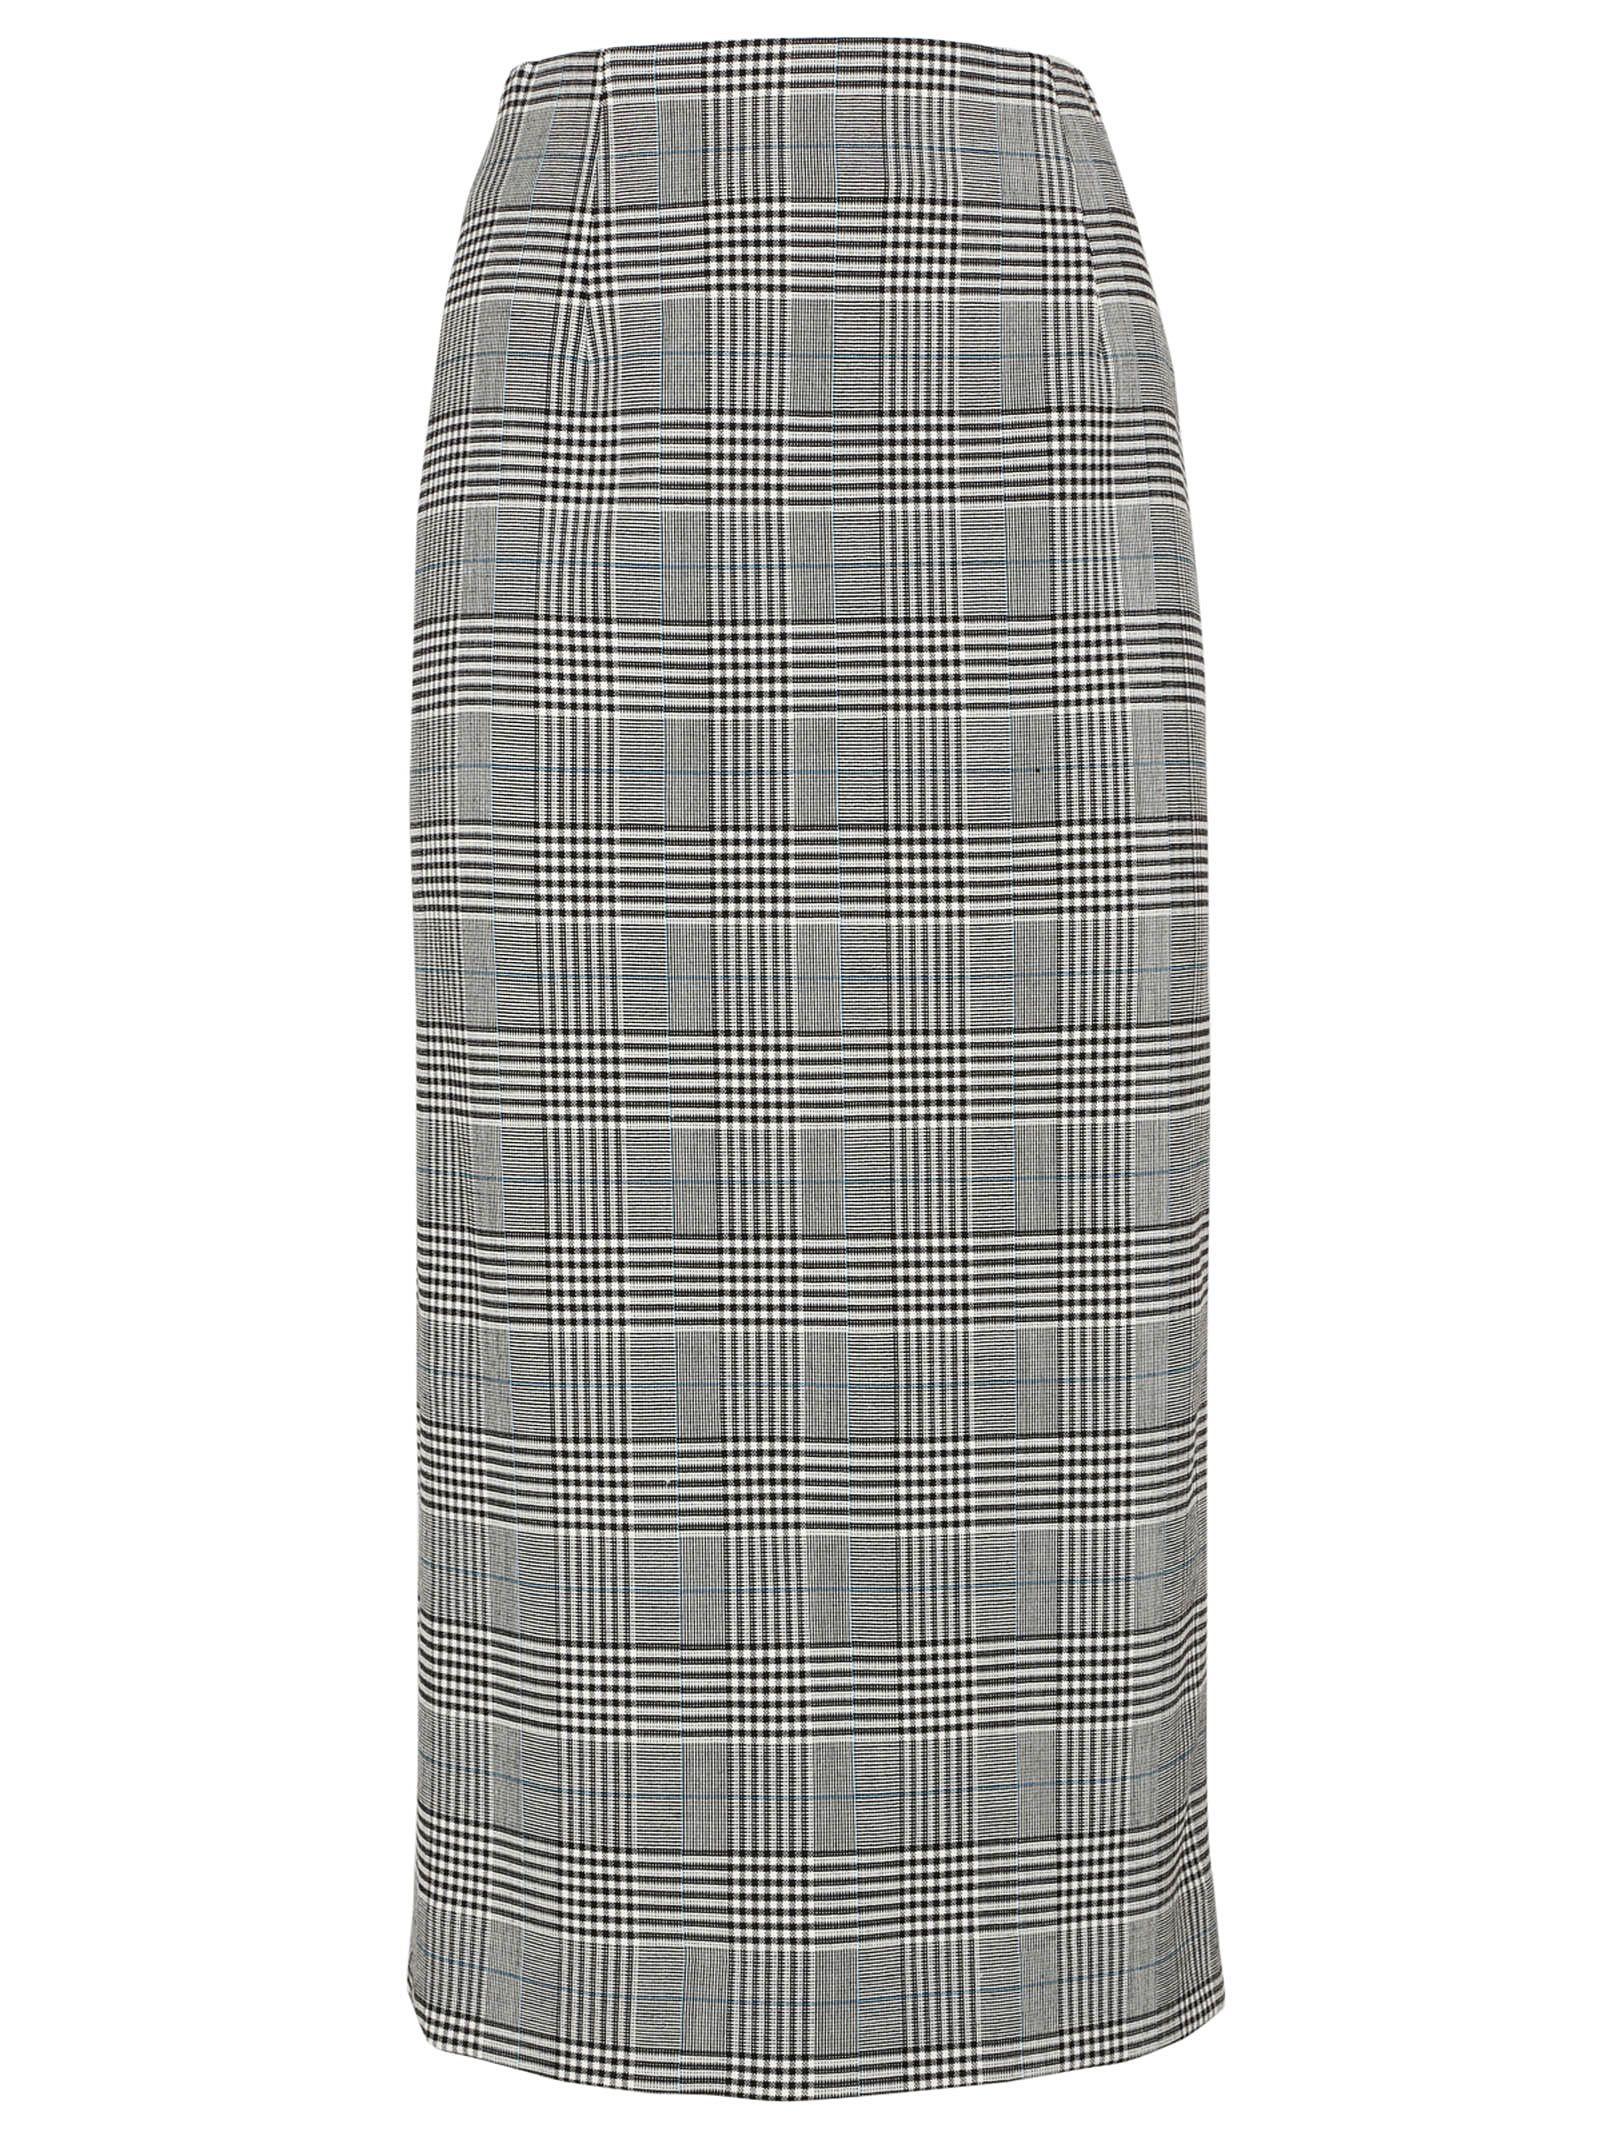 Victoria Beckham Plaid Pattern Skirt